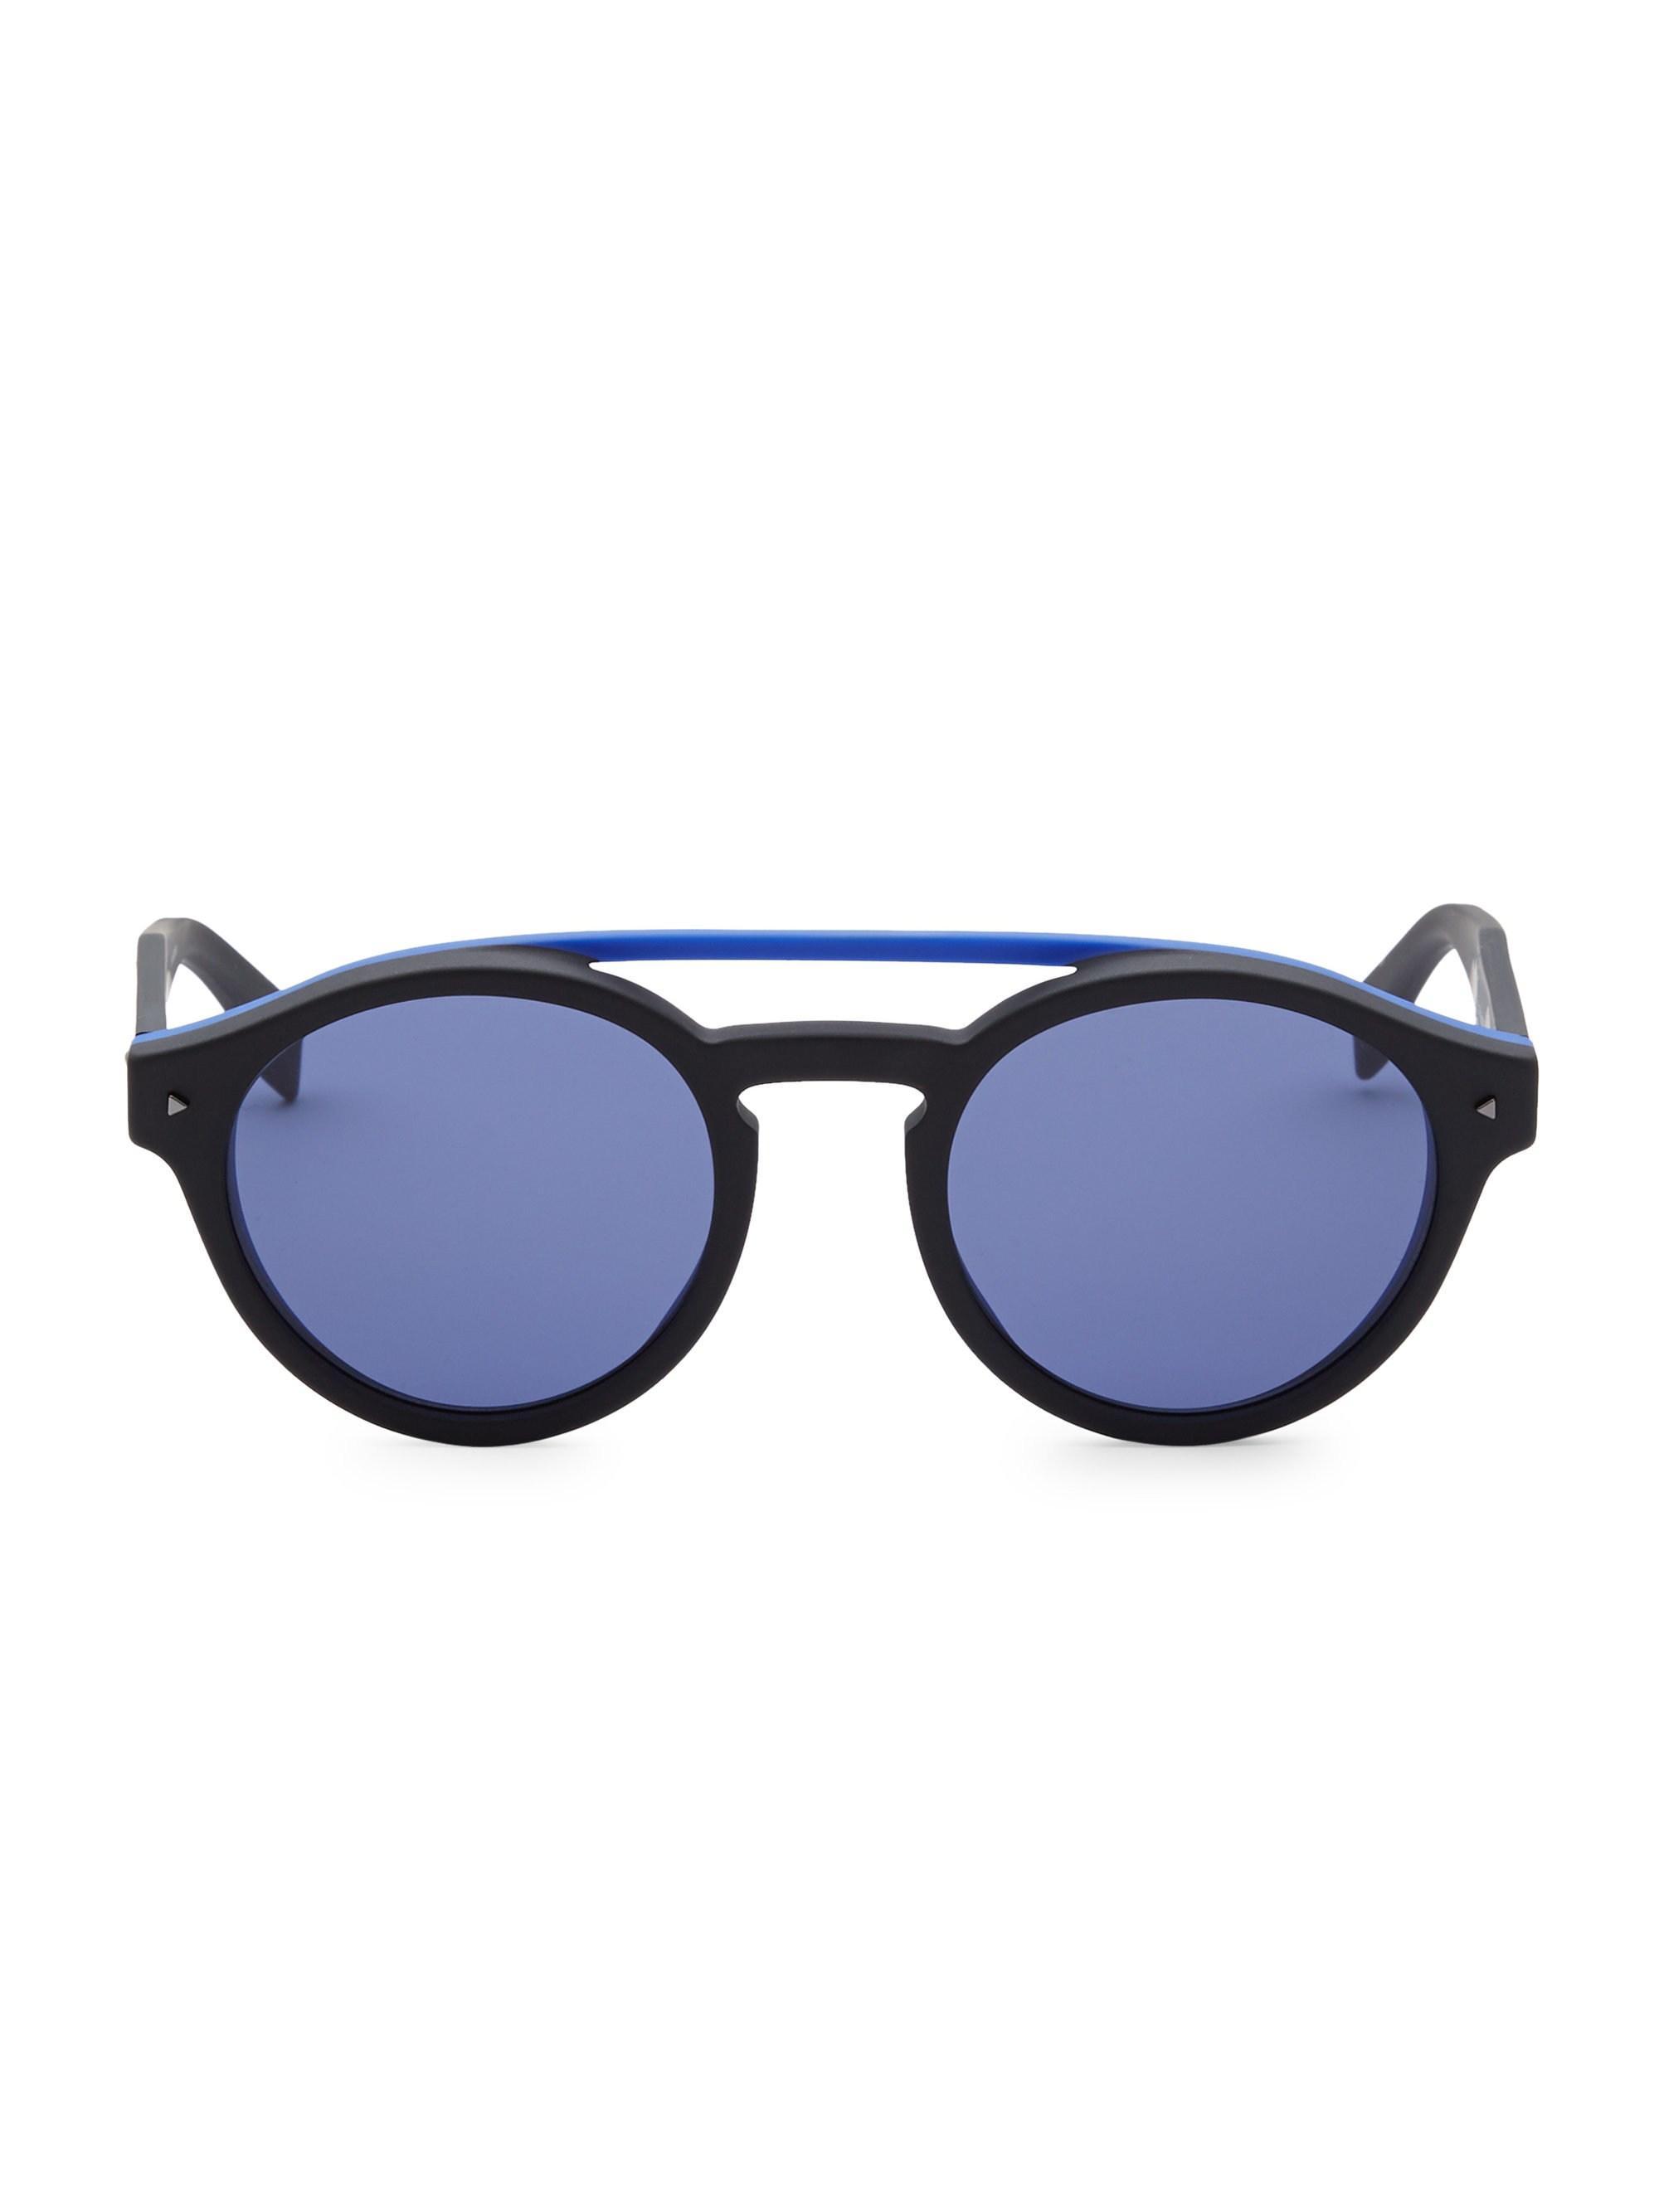 2f2c1637f91 Fendi. Men s Black 51mm Round Sunglasses.  350 From Saks Fifth Avenue